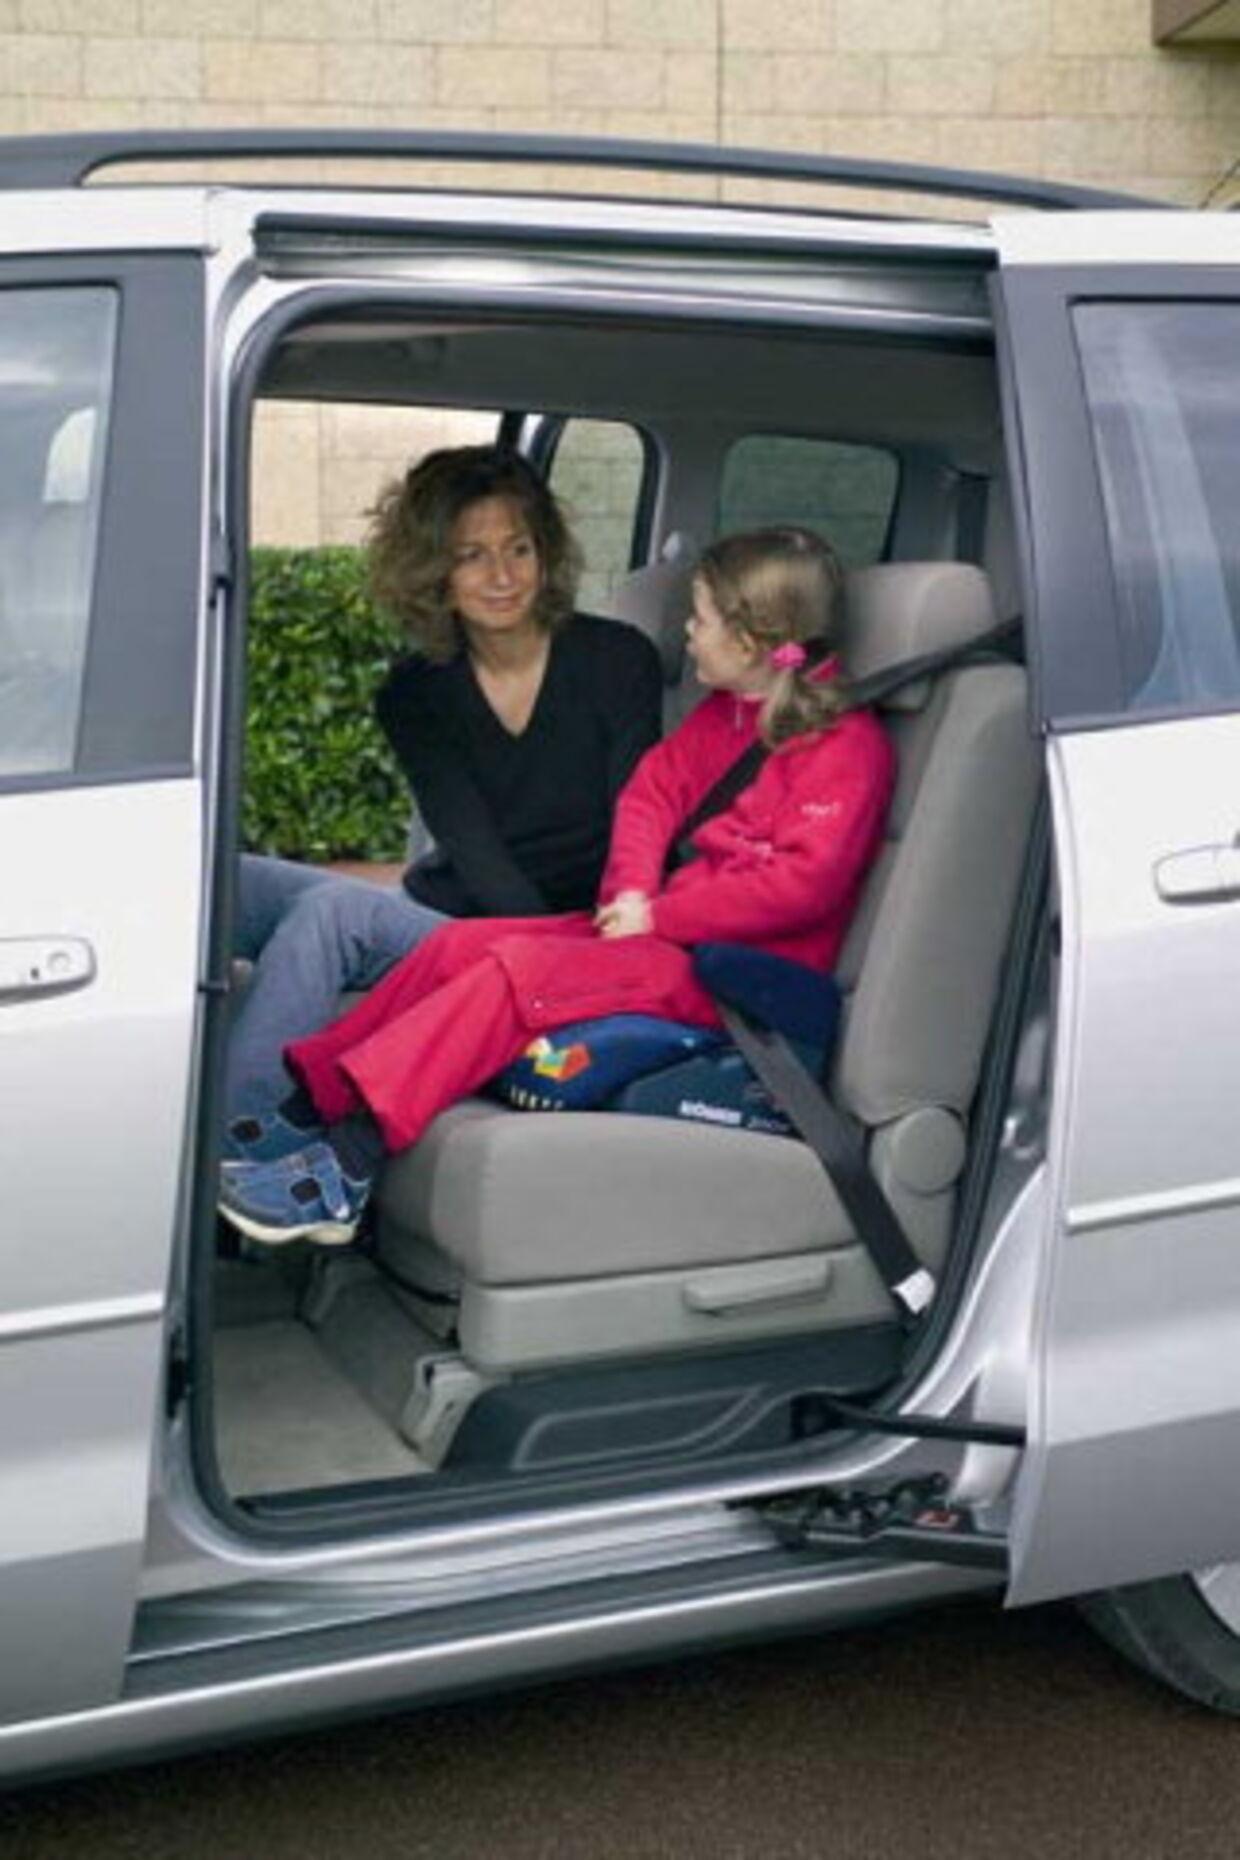 Euro NCAP tester også børns sikkerhed i bilen. Her er det den nye Mazda 5 med mor og barn, før bilen ruller mod muren. Dog med dukker.